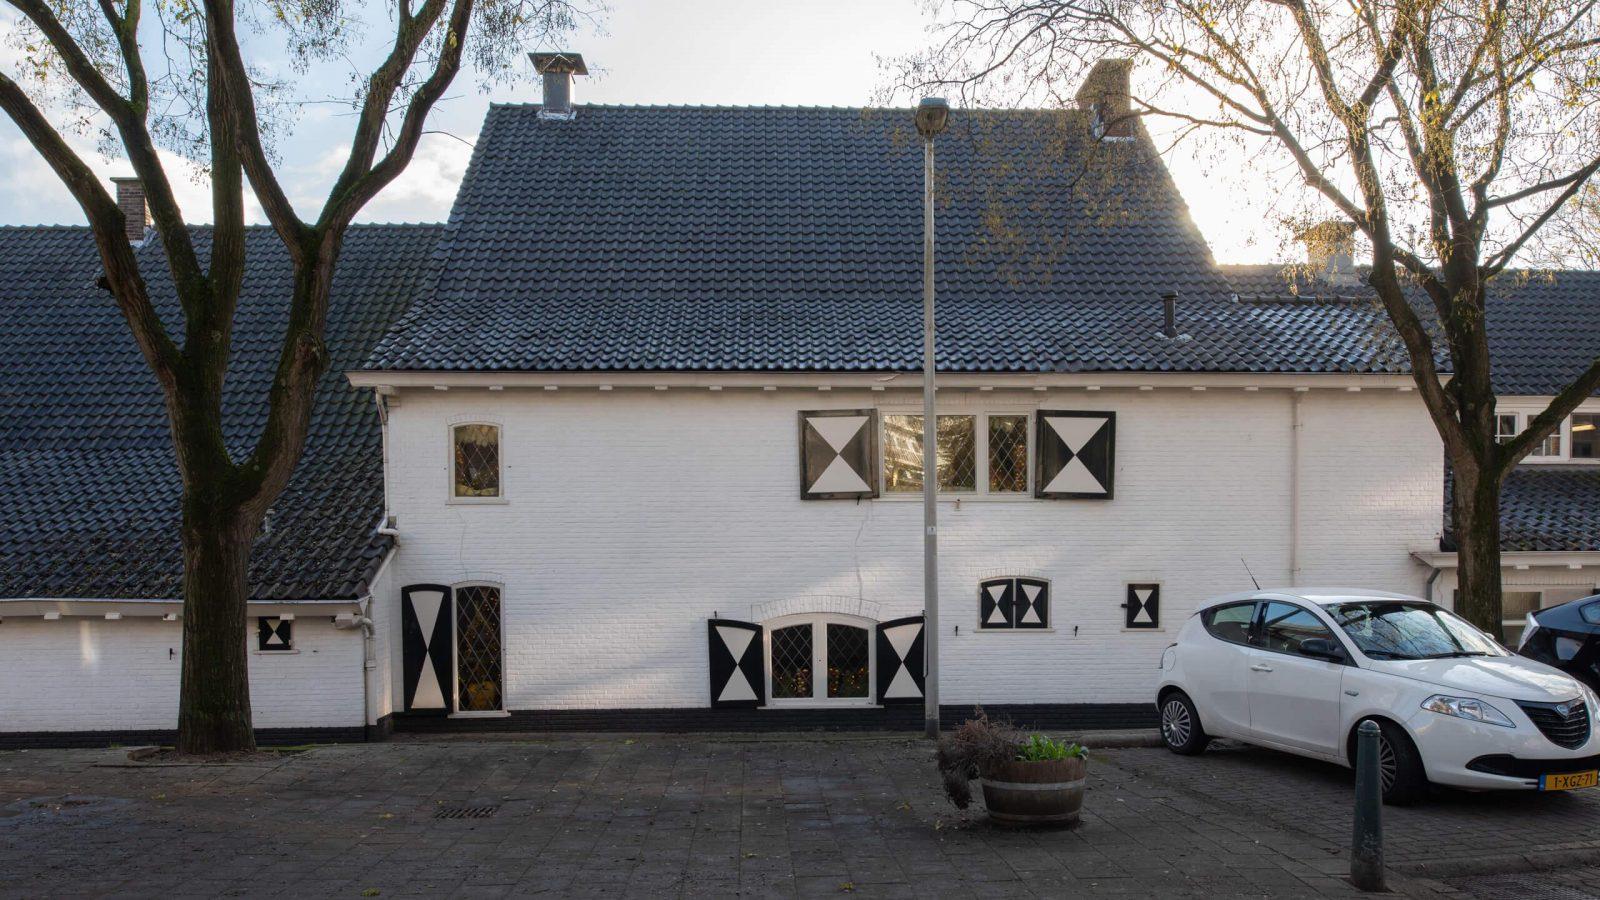 2021 Marlies Lageweg DSC 5263 Old Dutch